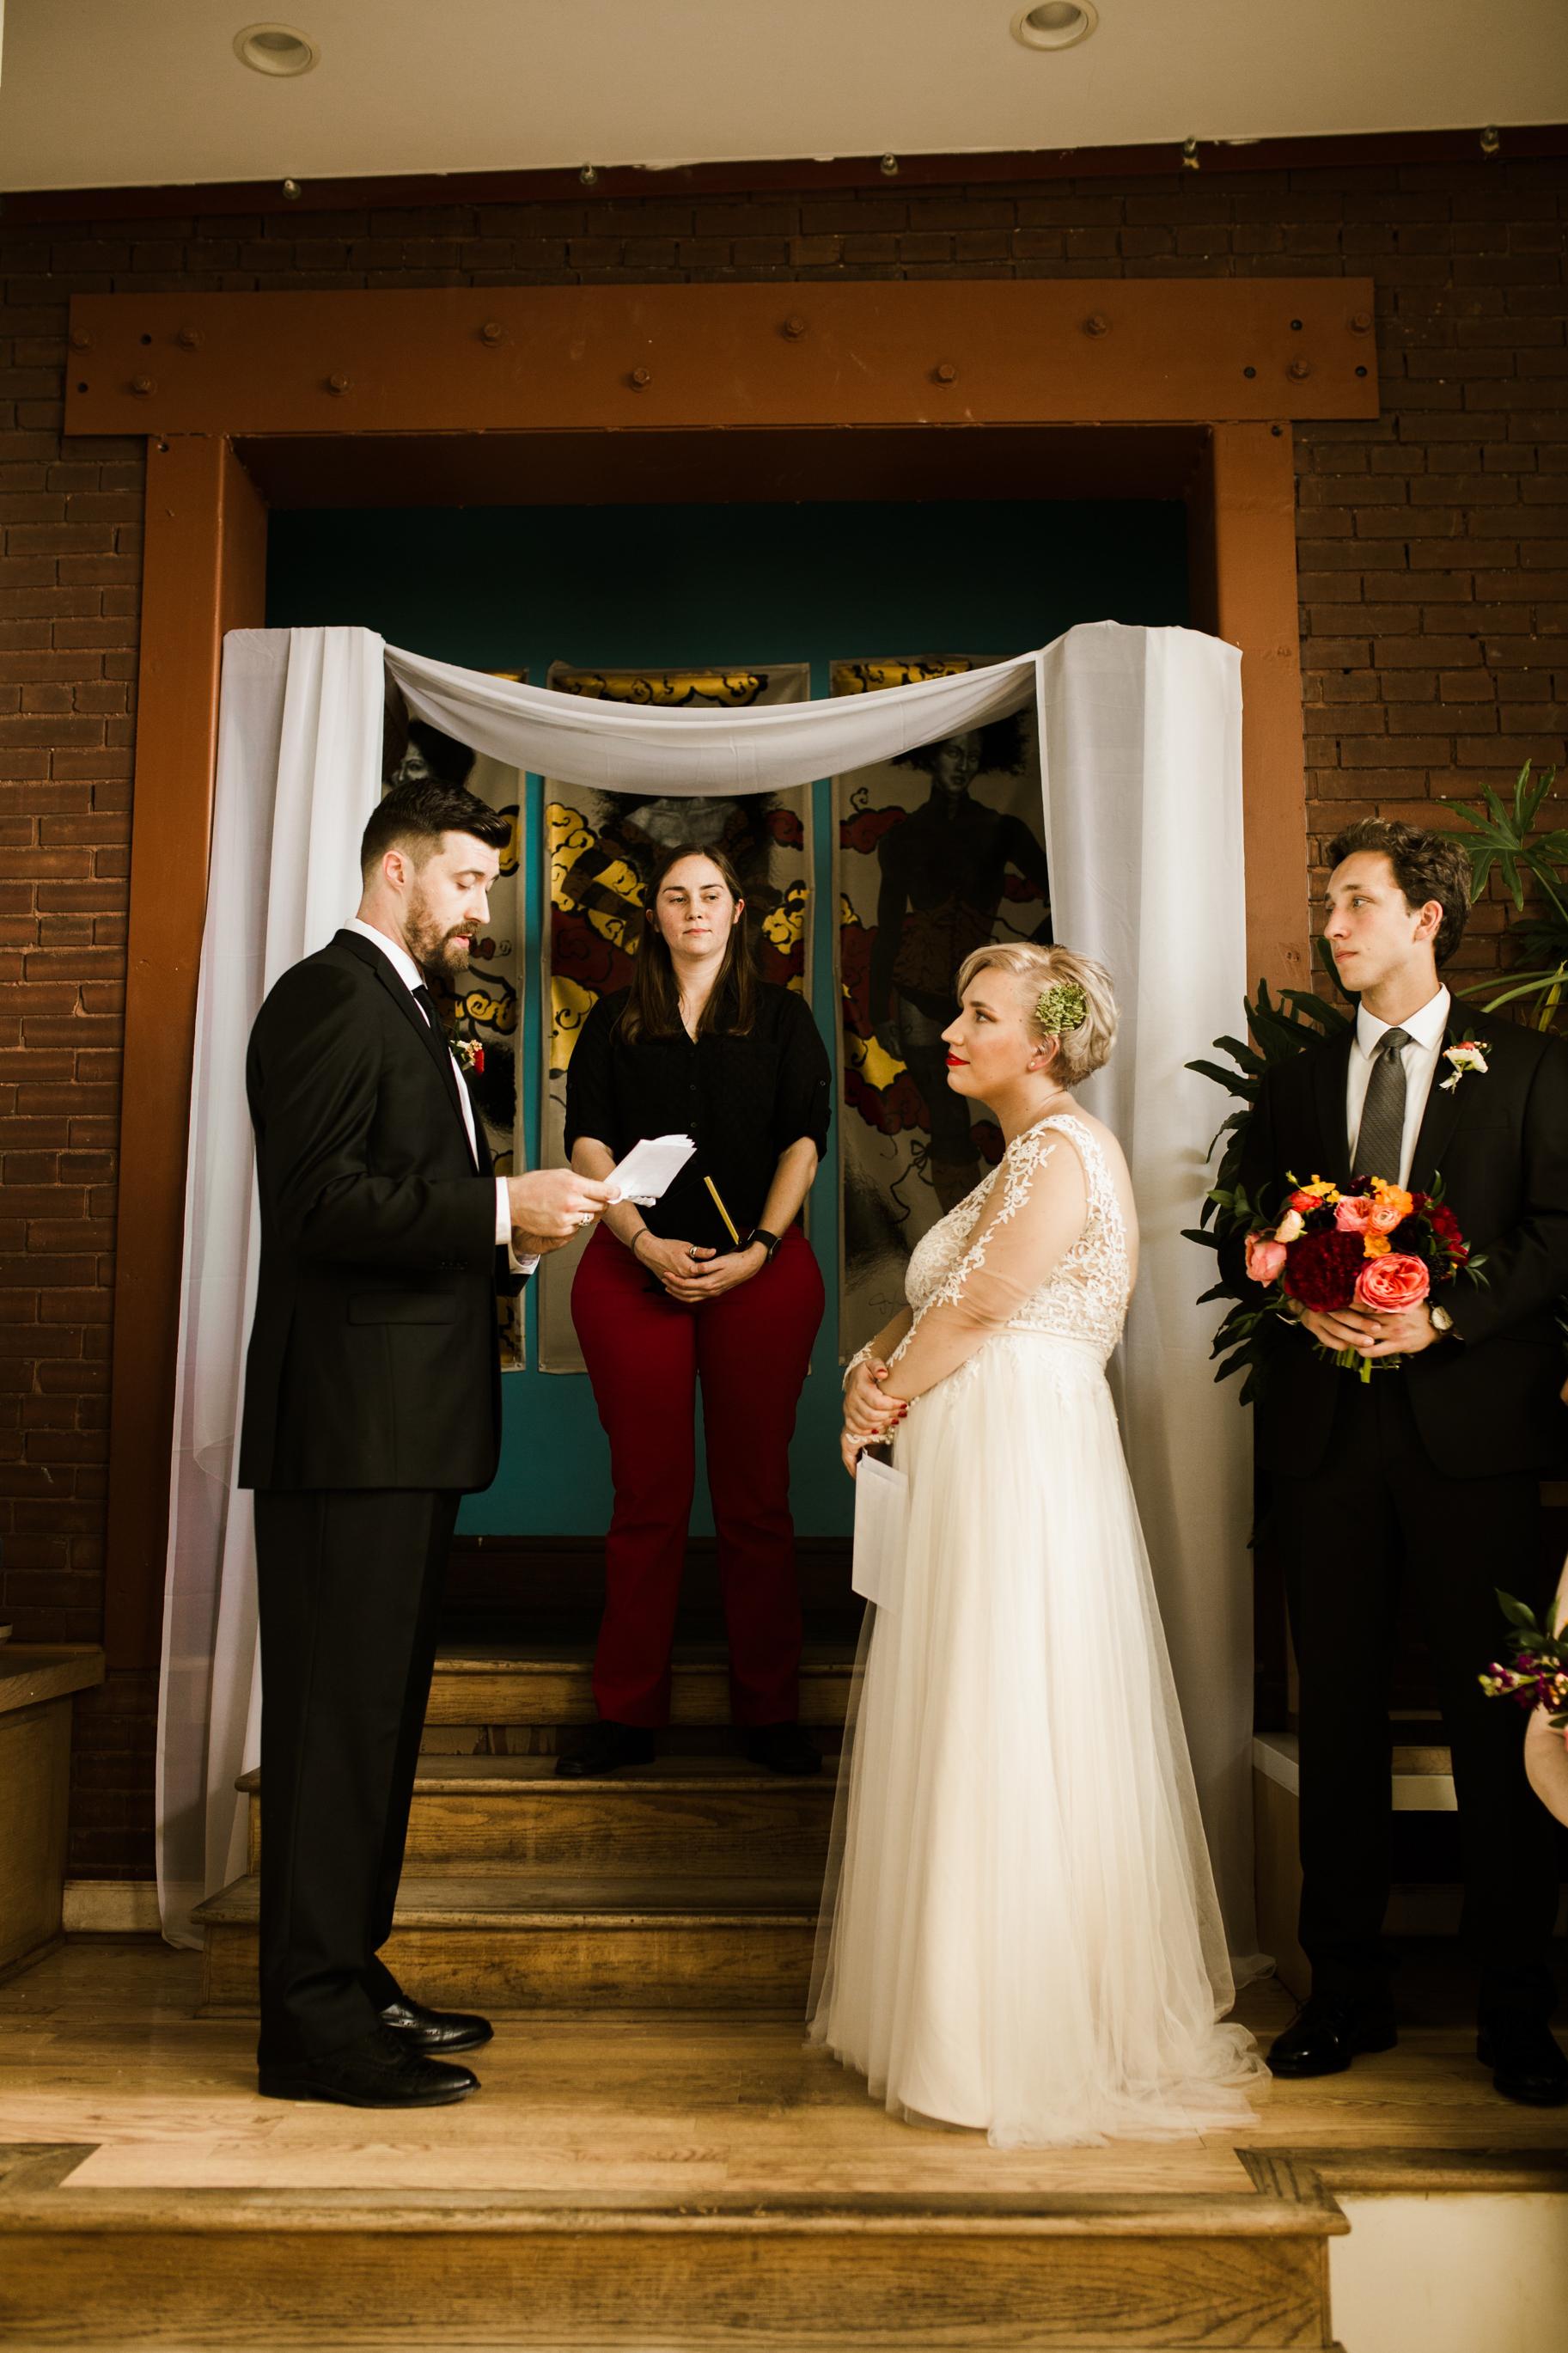 Kentucky Wedding Louisville Wedding Photographer 2018 Crystal Ludwick Photo Louisville Wedding Photographer Kentucky Wedding Photographer (50 of 105).jpg